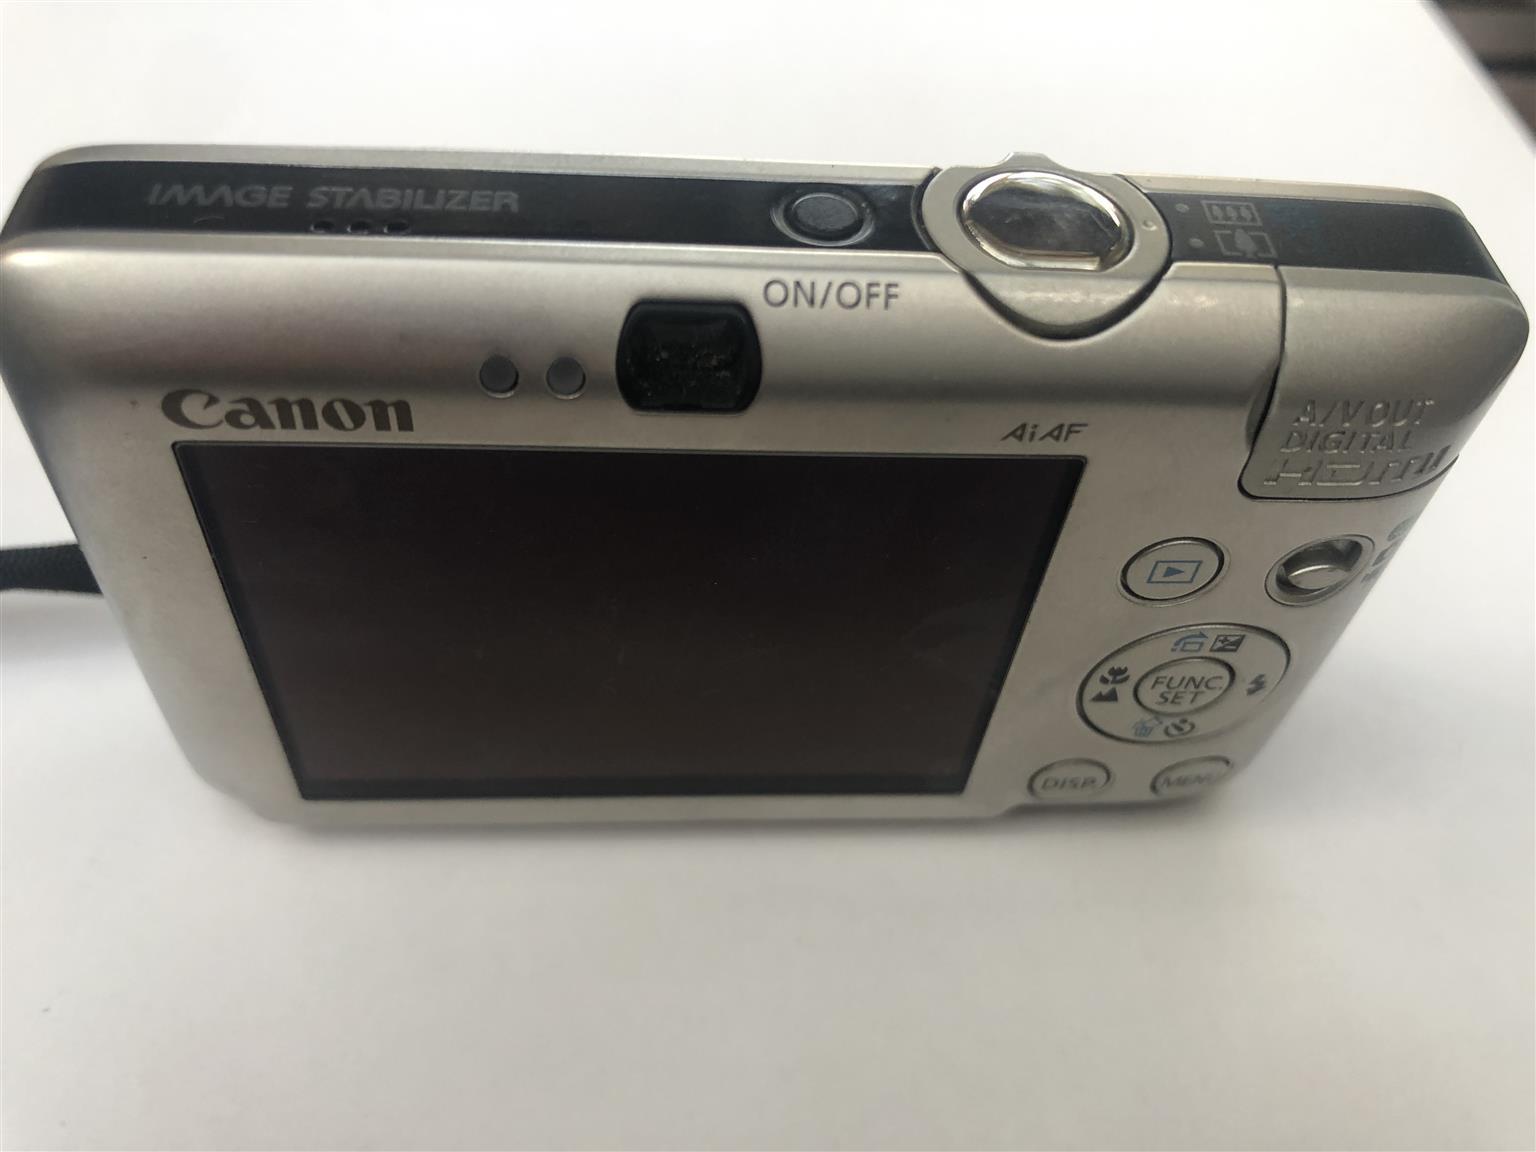 Canon IXUS 100 Digital Camera